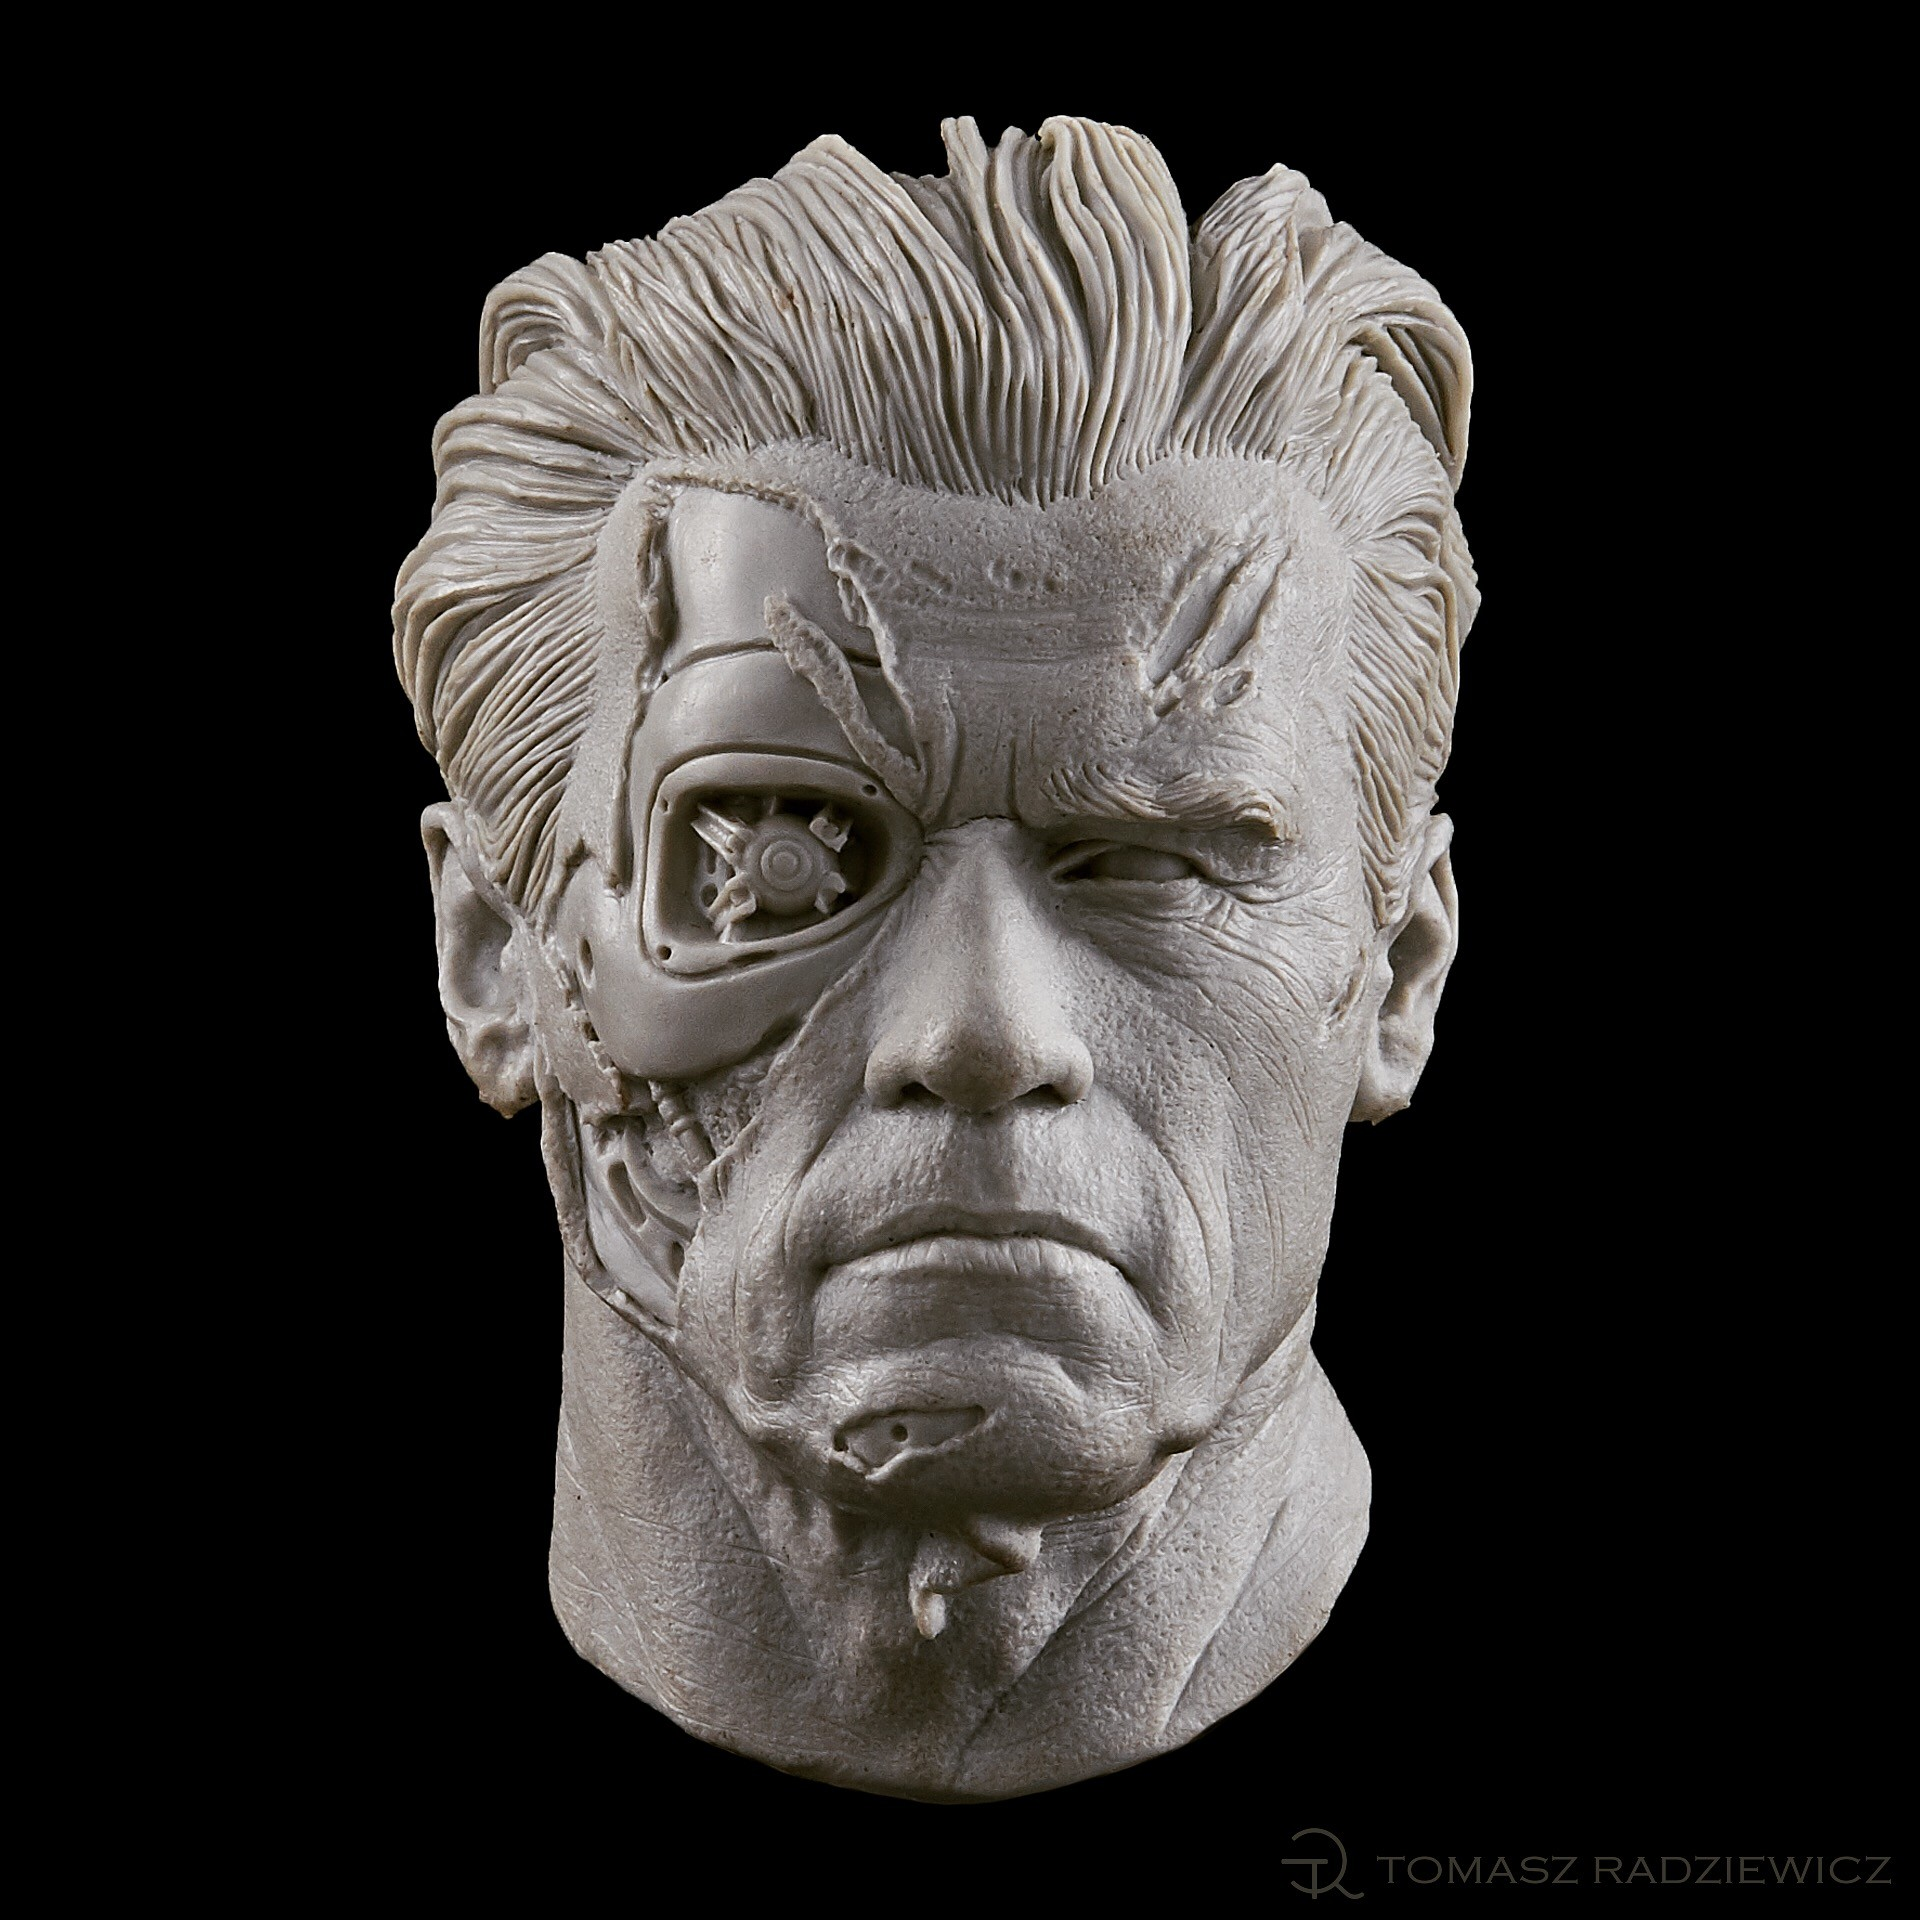 Terminator/cast resin/45mm